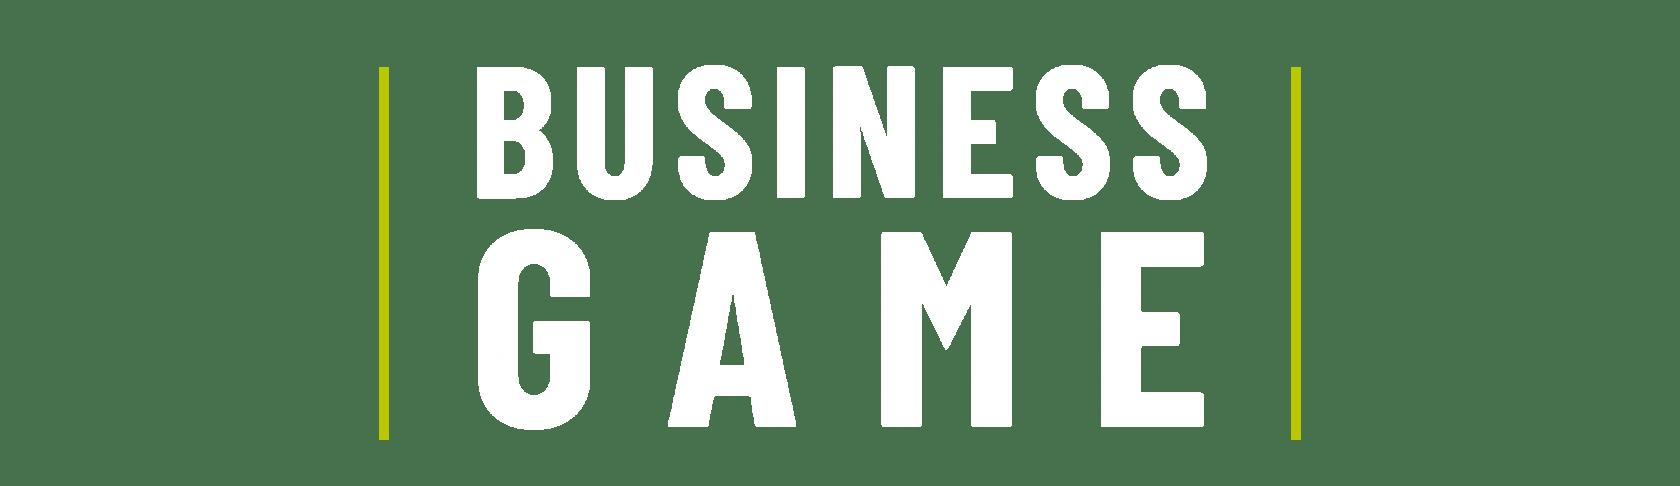 Header_Business_Game_Tavola disegno 1